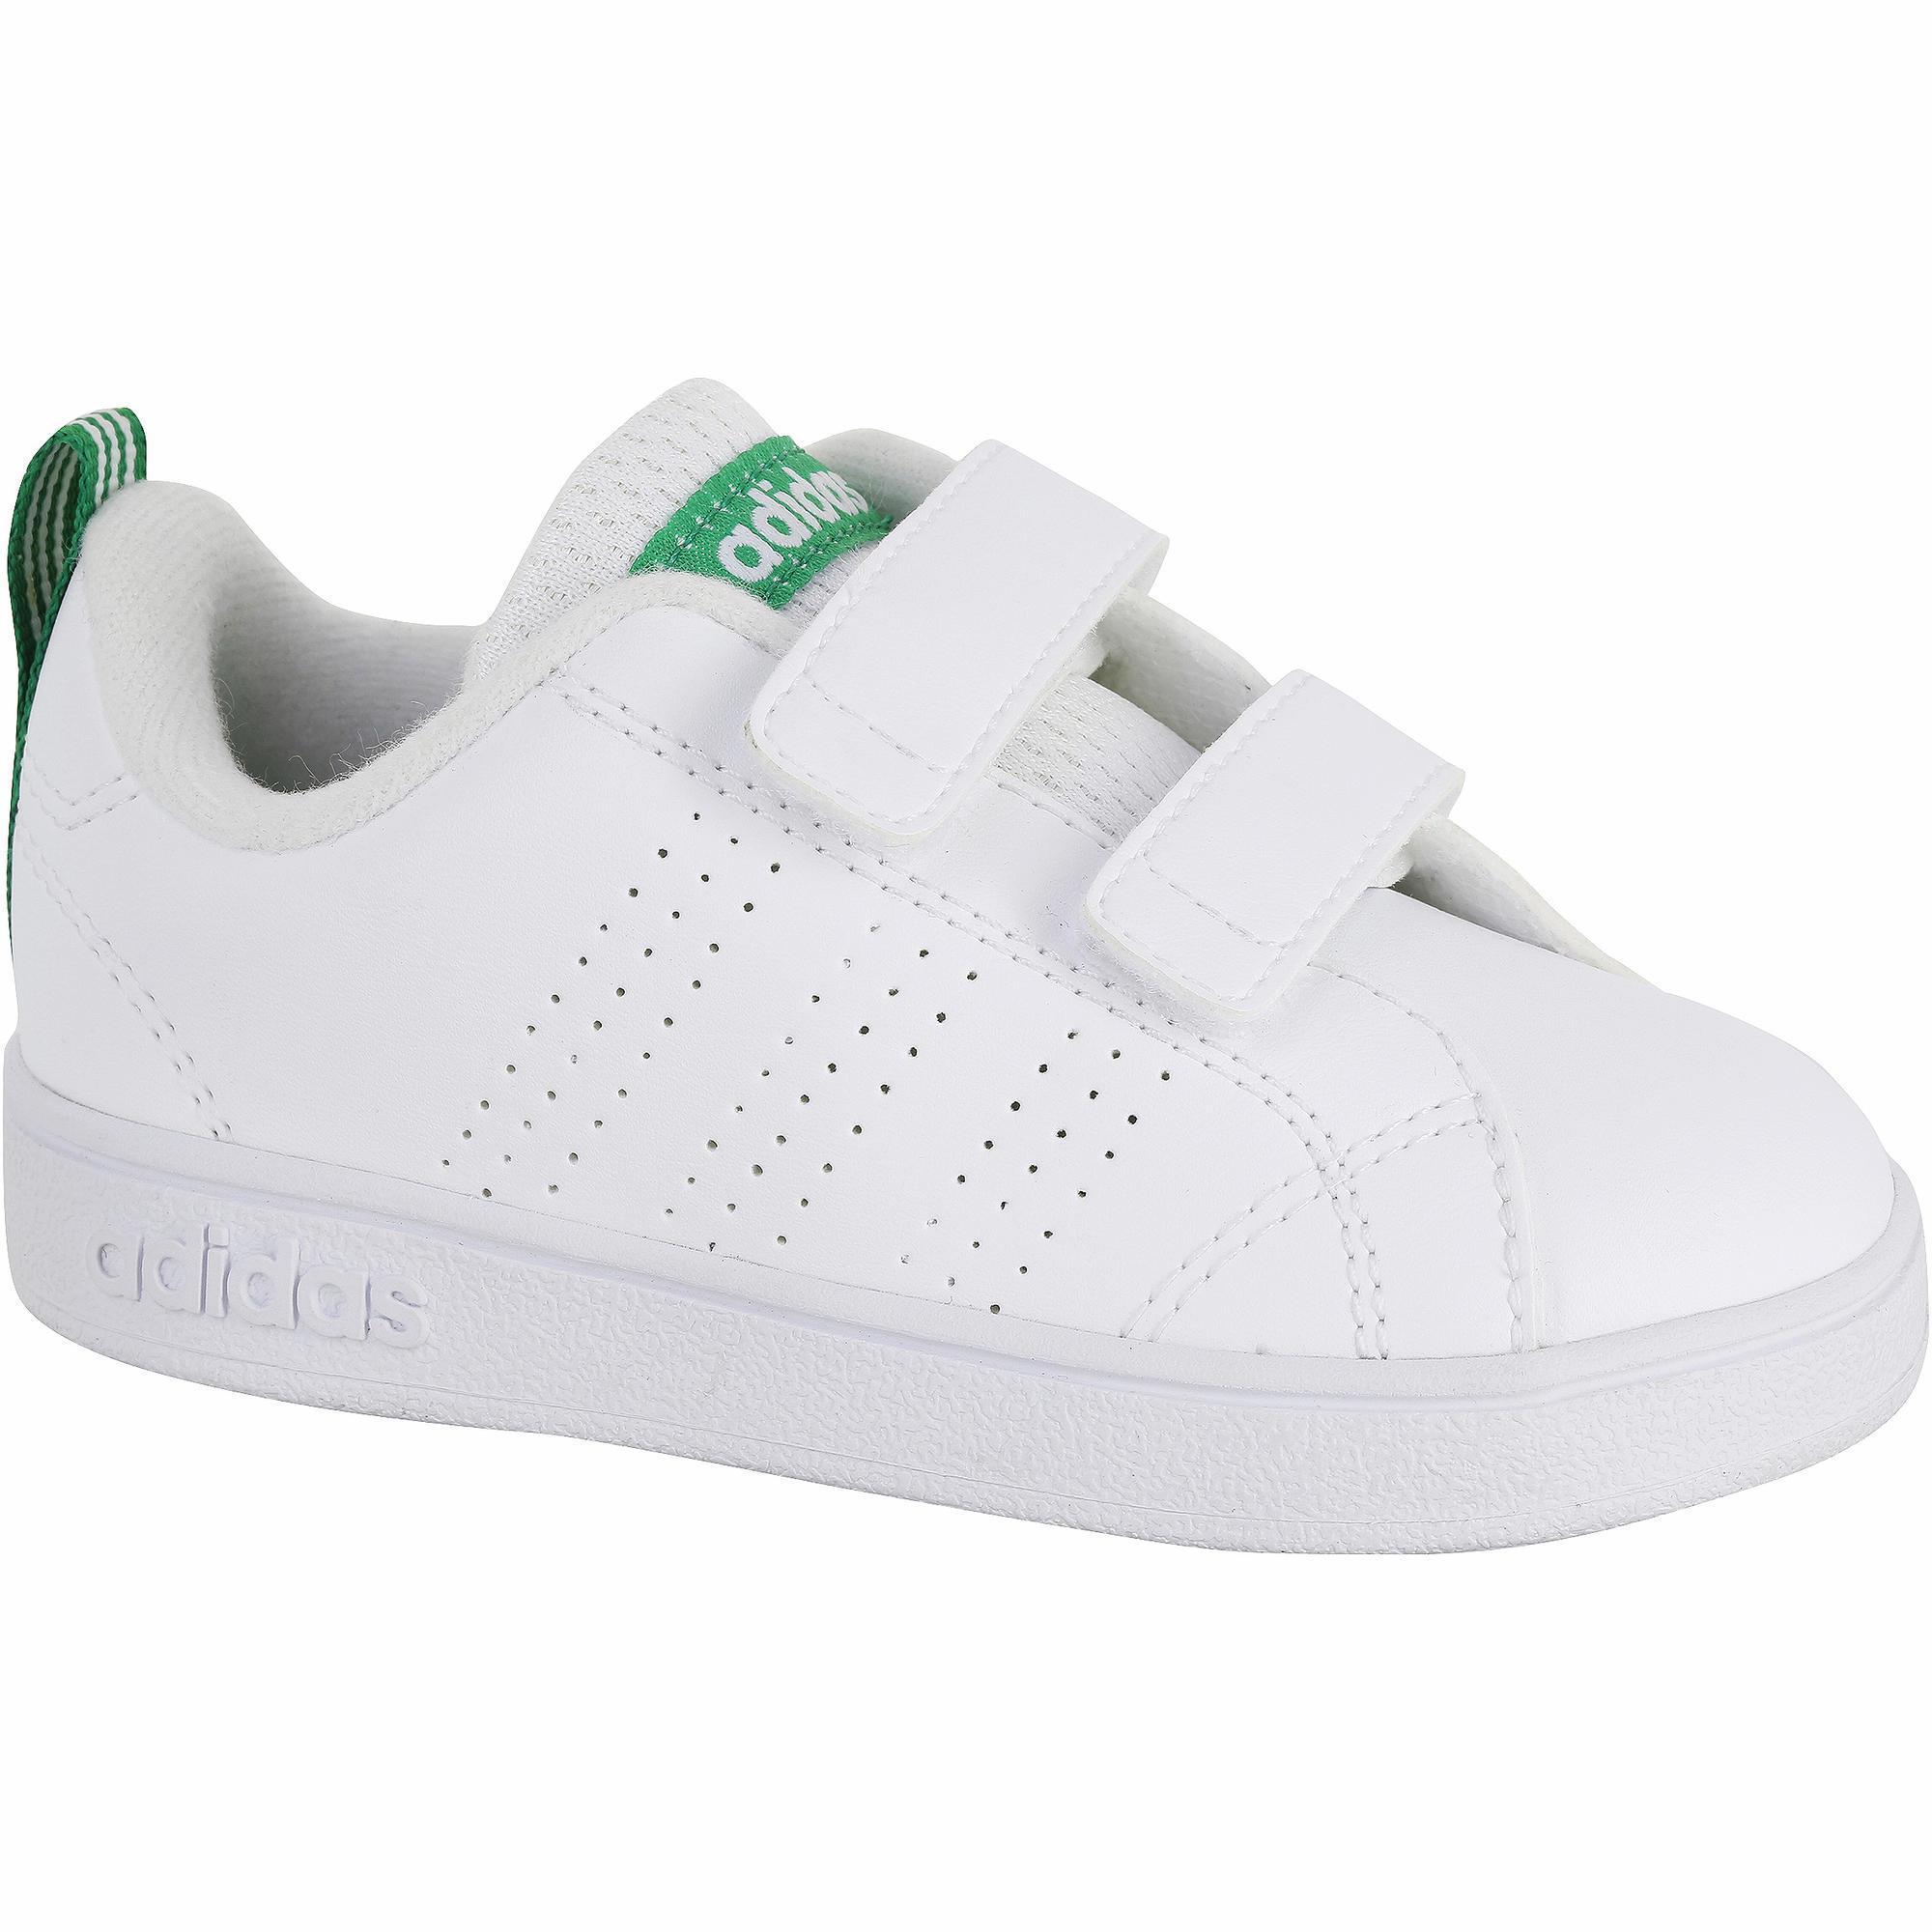 bf7762ad842 Adidas